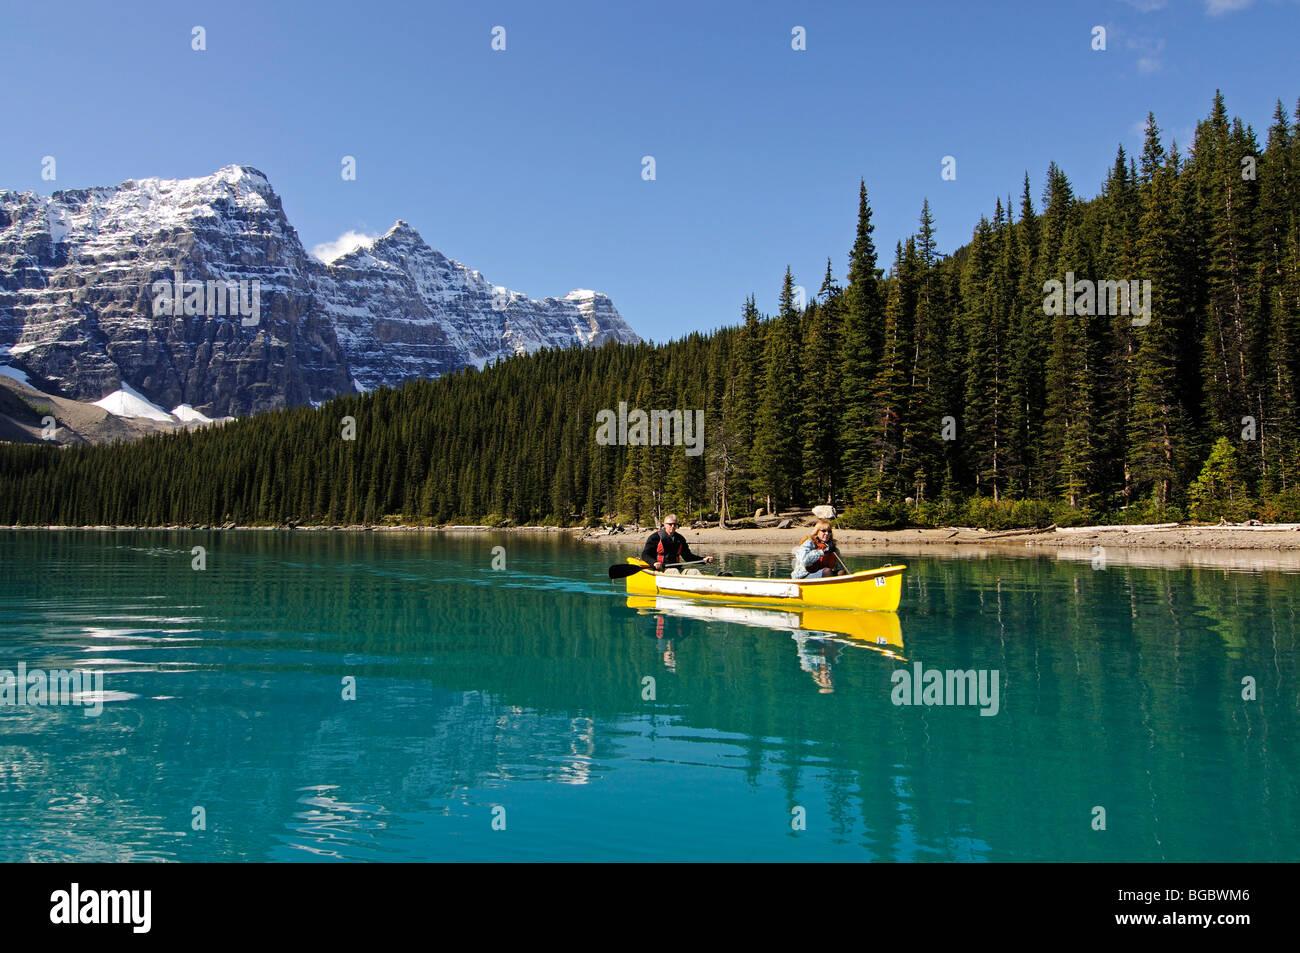 Couple in canoe, Moraine Lake, Banff National Park, Alberta, Canada - Stock Image